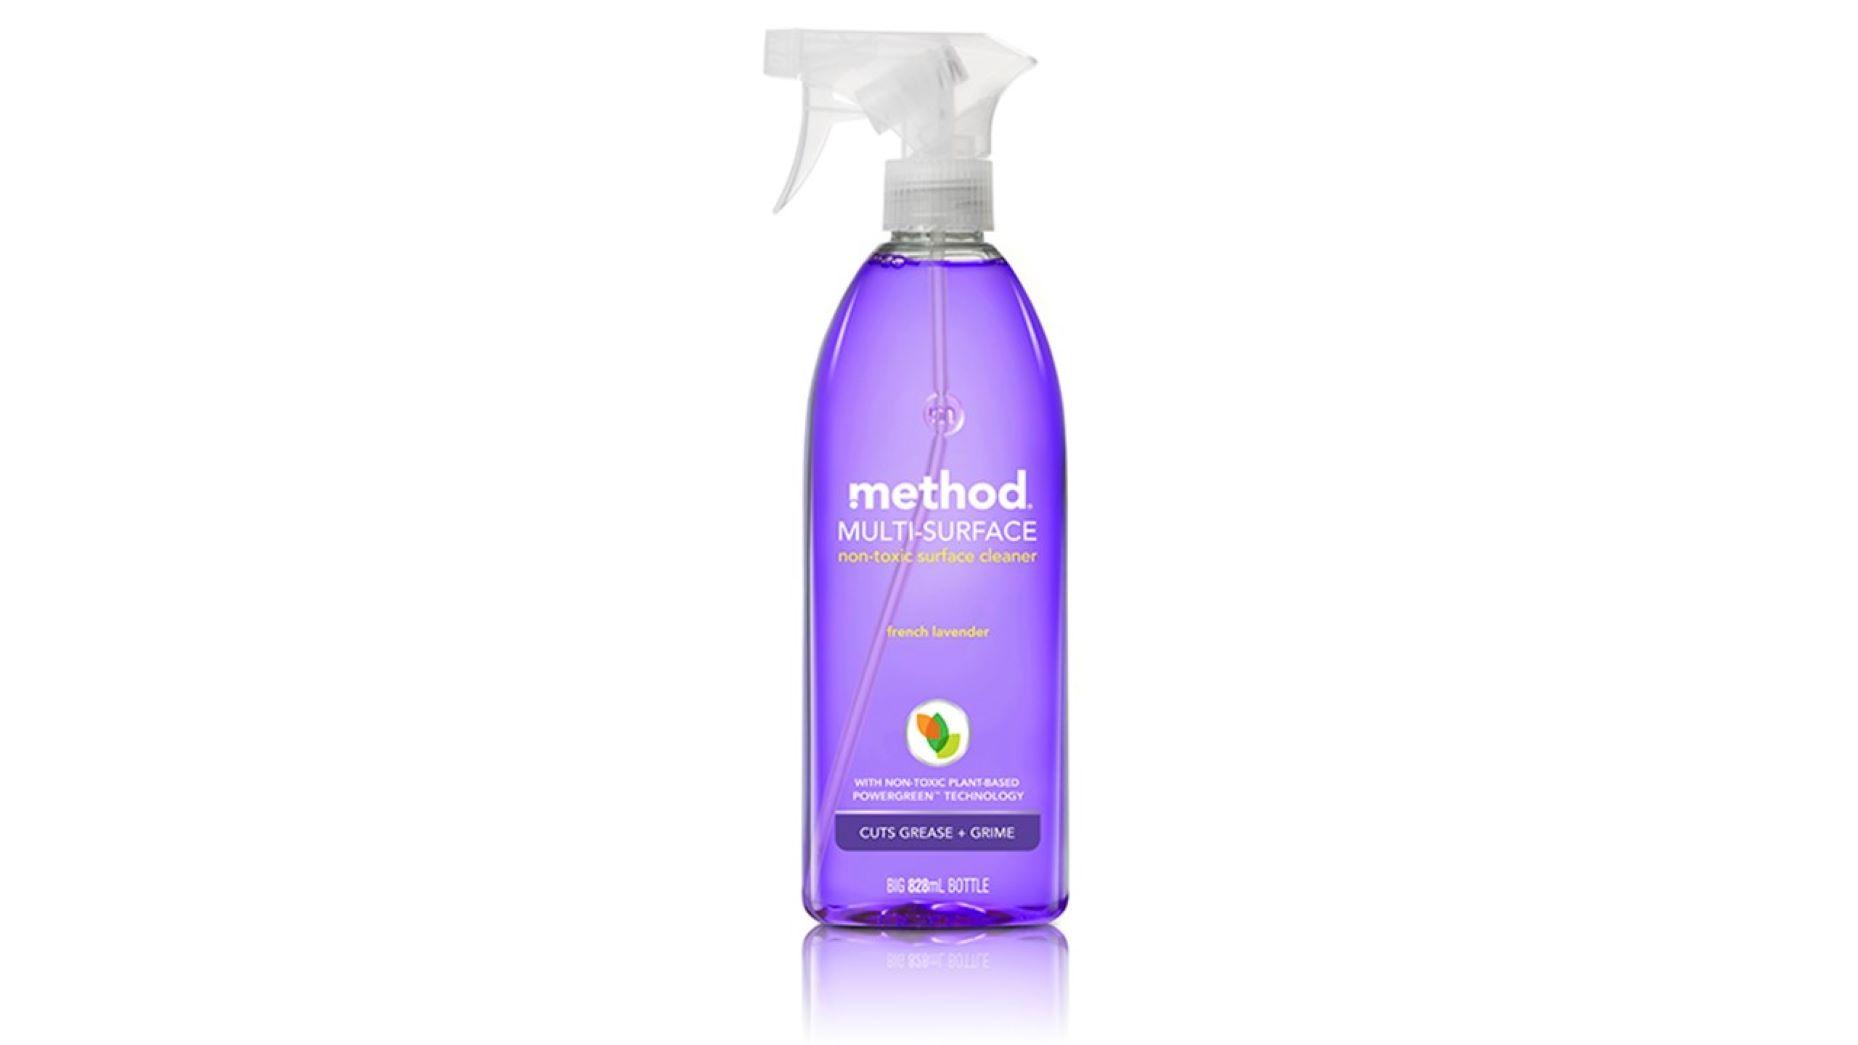 method Yleispuhdistussuihke French Lavender 828ml